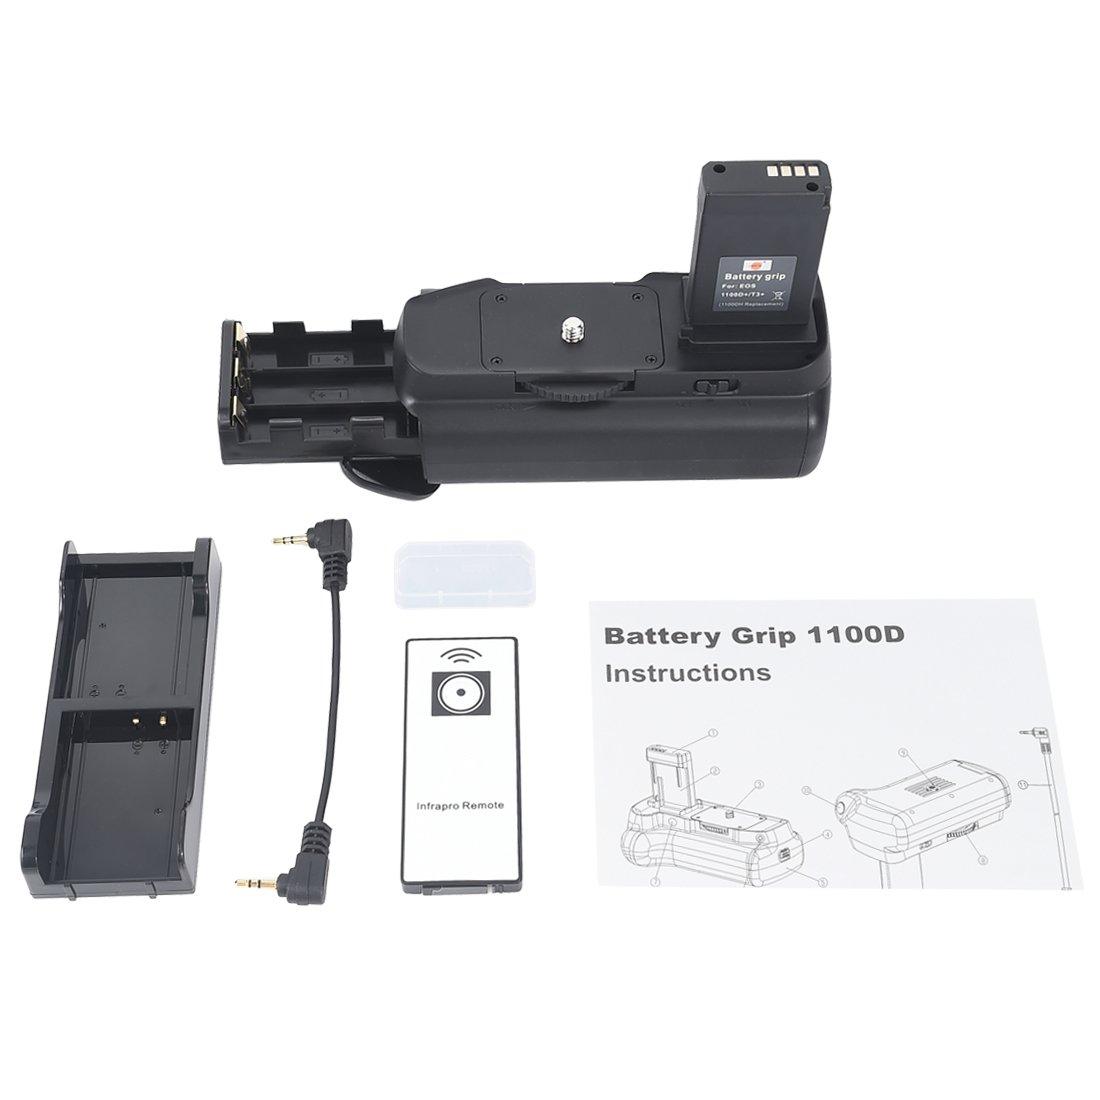 DSTE/® Pro IR Remote 1100D Vertical Battery Grip 2x LP-E10 Battery for Canon EOS 1100D Rebel T3 SLR Digital Camera